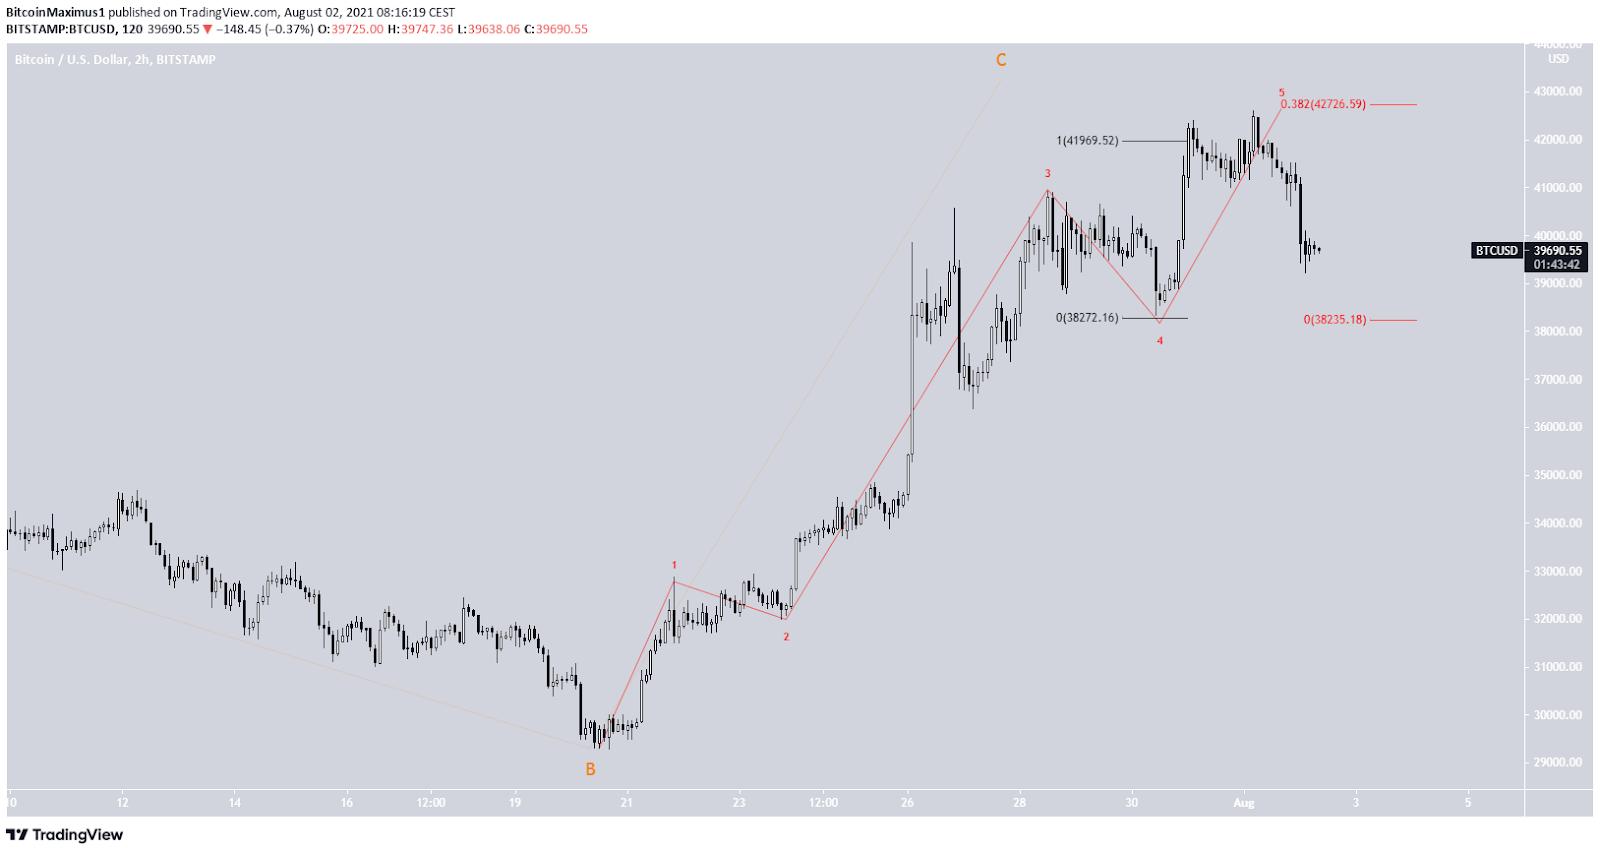 Bitcoin Preis Kurs BTC Wellenanalyse 2 01.08.20201